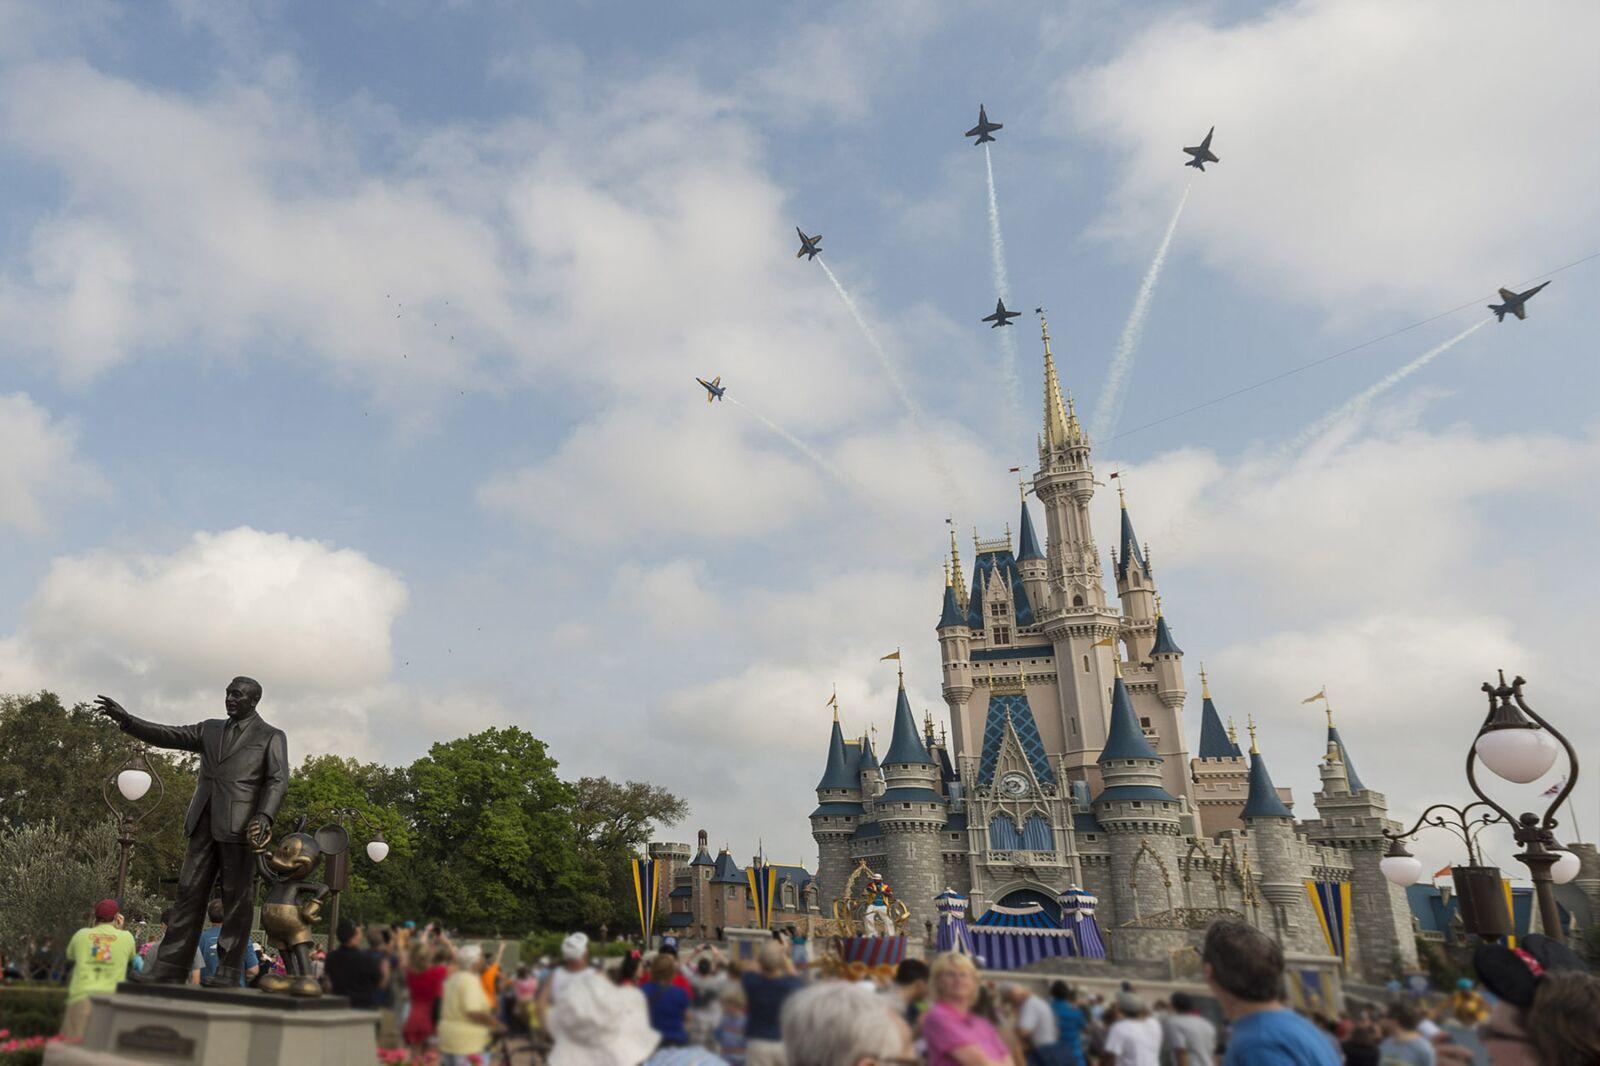 Is outside food allowed at Walt Disney World parks?